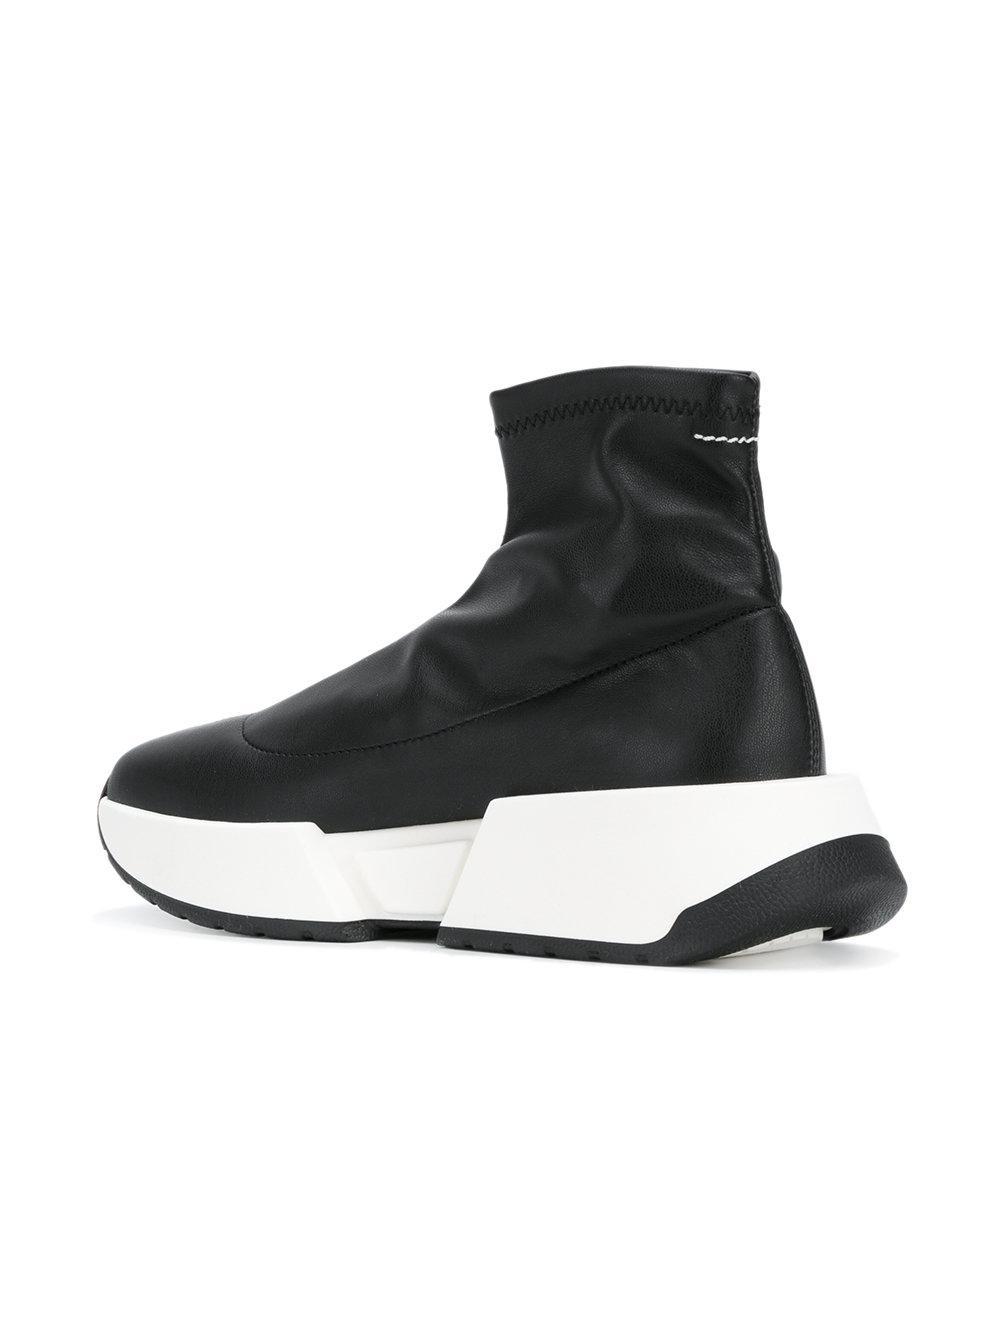 MM6 Maison Martin Margiela Black Pearl Sock High-Top Sneakers